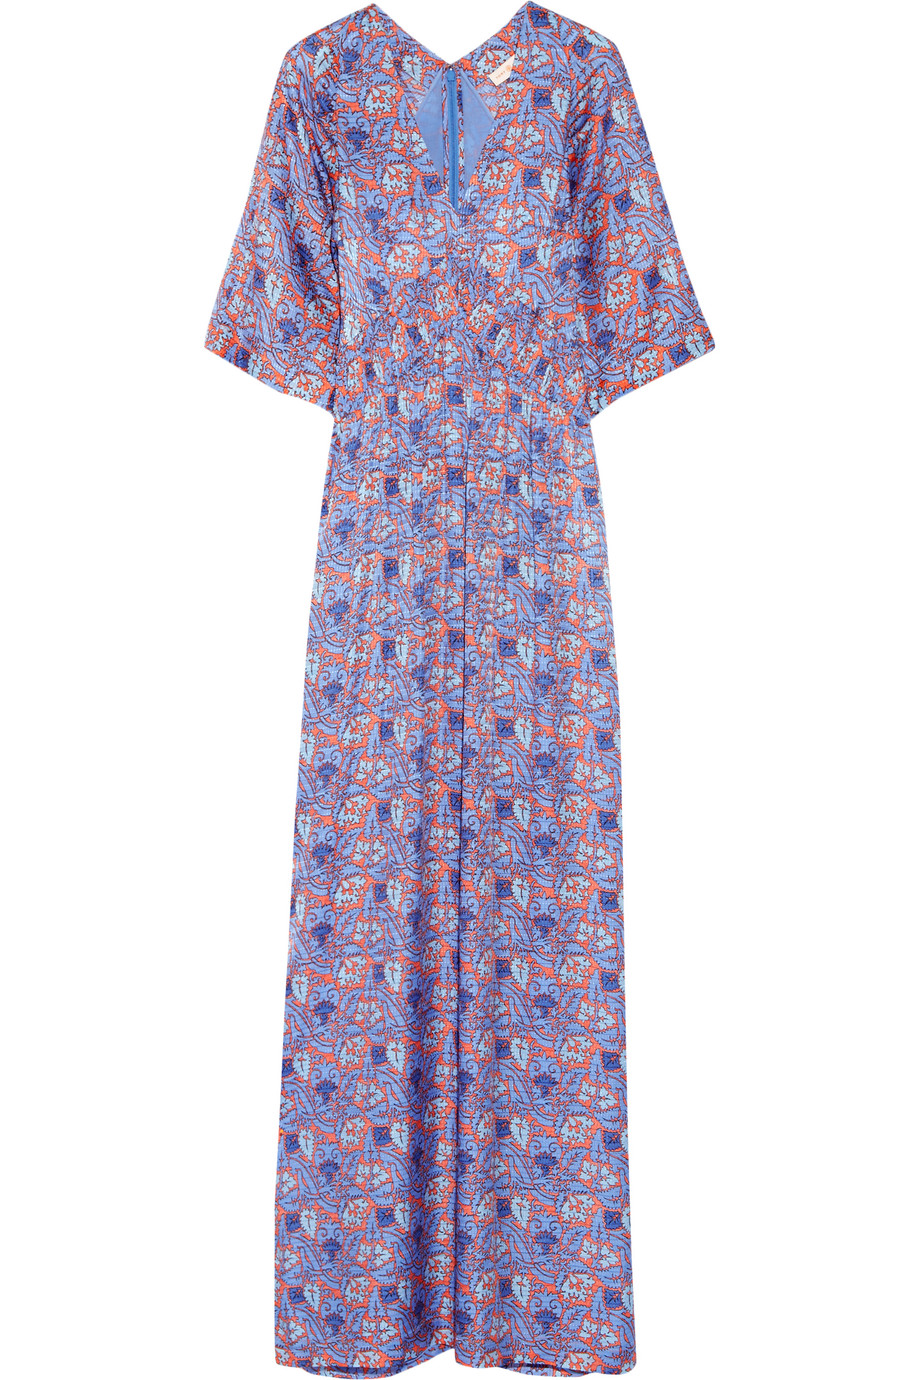 Tory Burch Corinne Printed Silk-Blend Maxi Dress, Purple, Women's - Printed, Size: 10